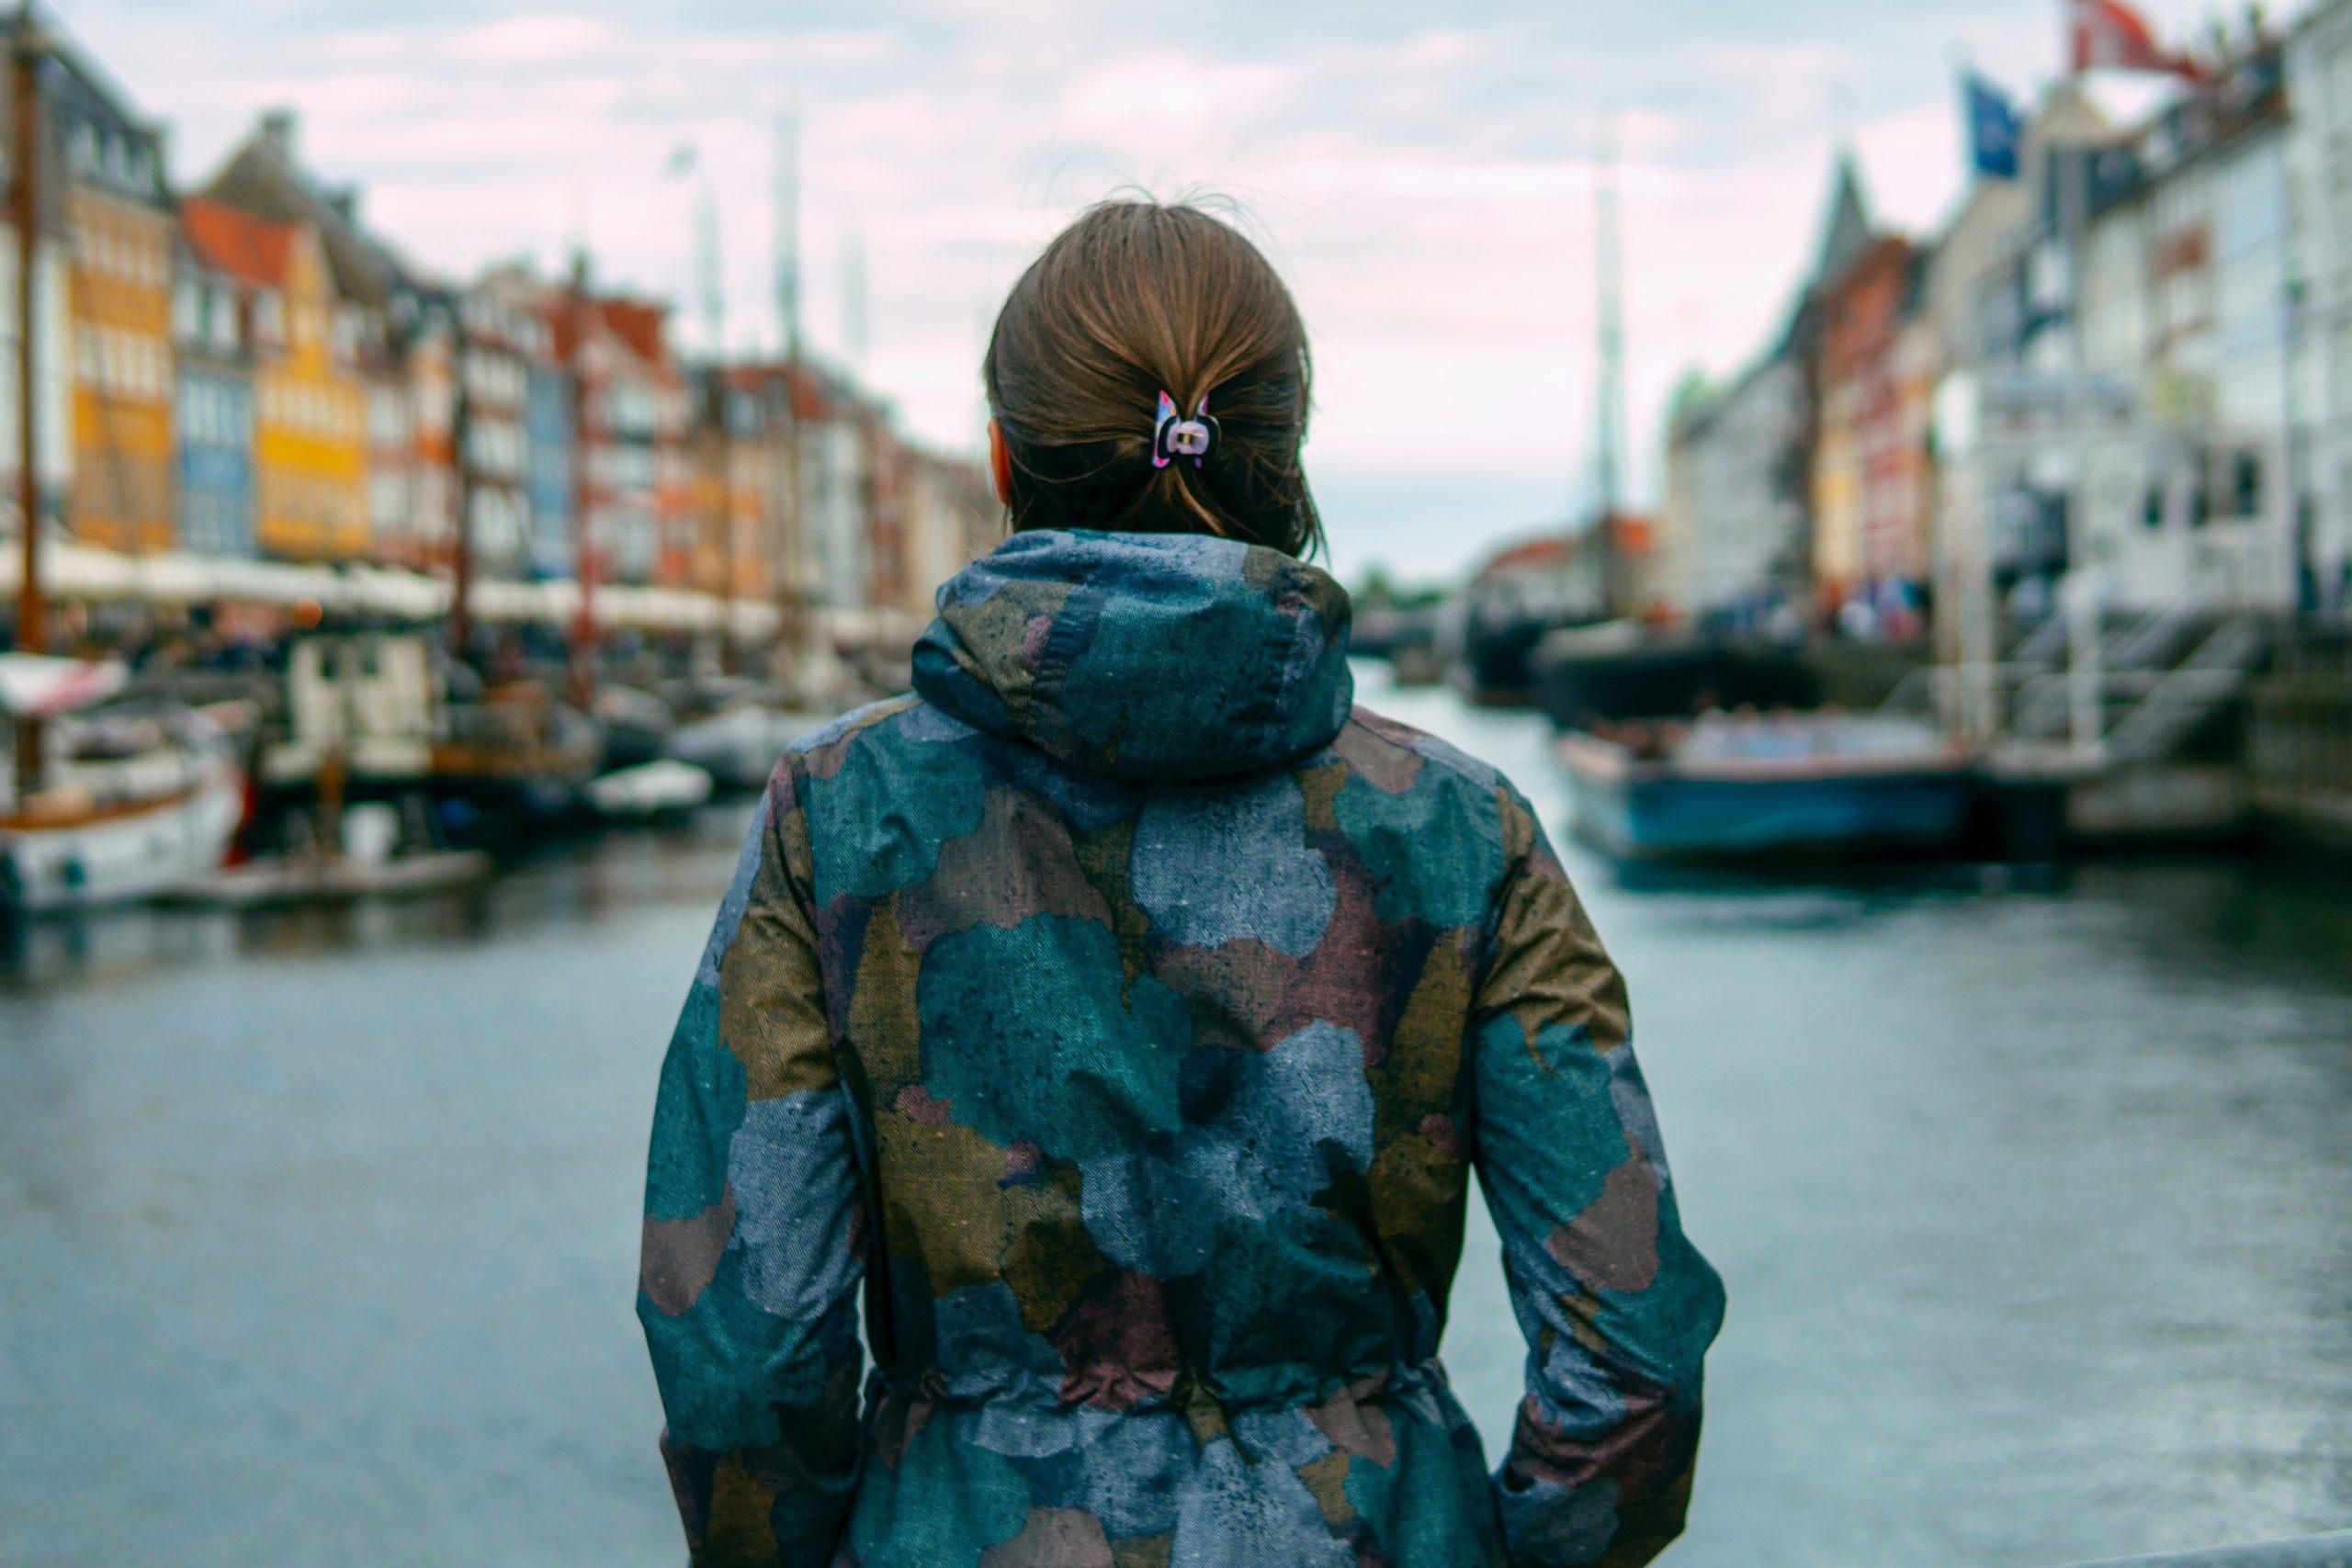 Denmark is preparing the future of work